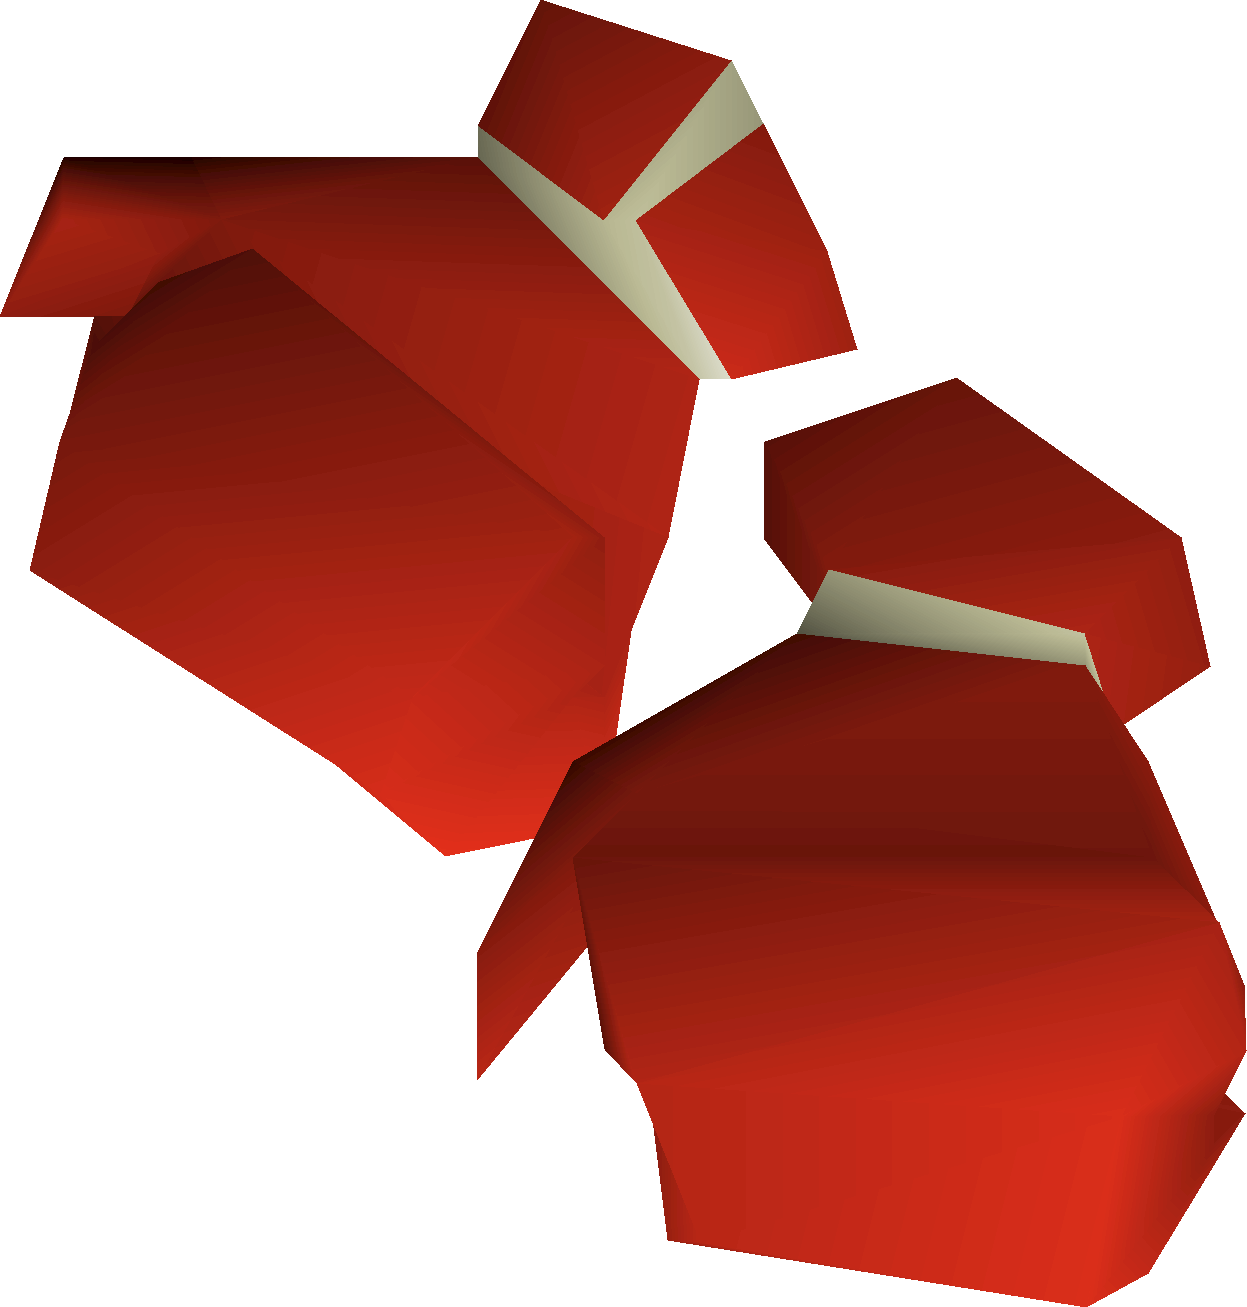 Boxing gloves - OSRS Wiki